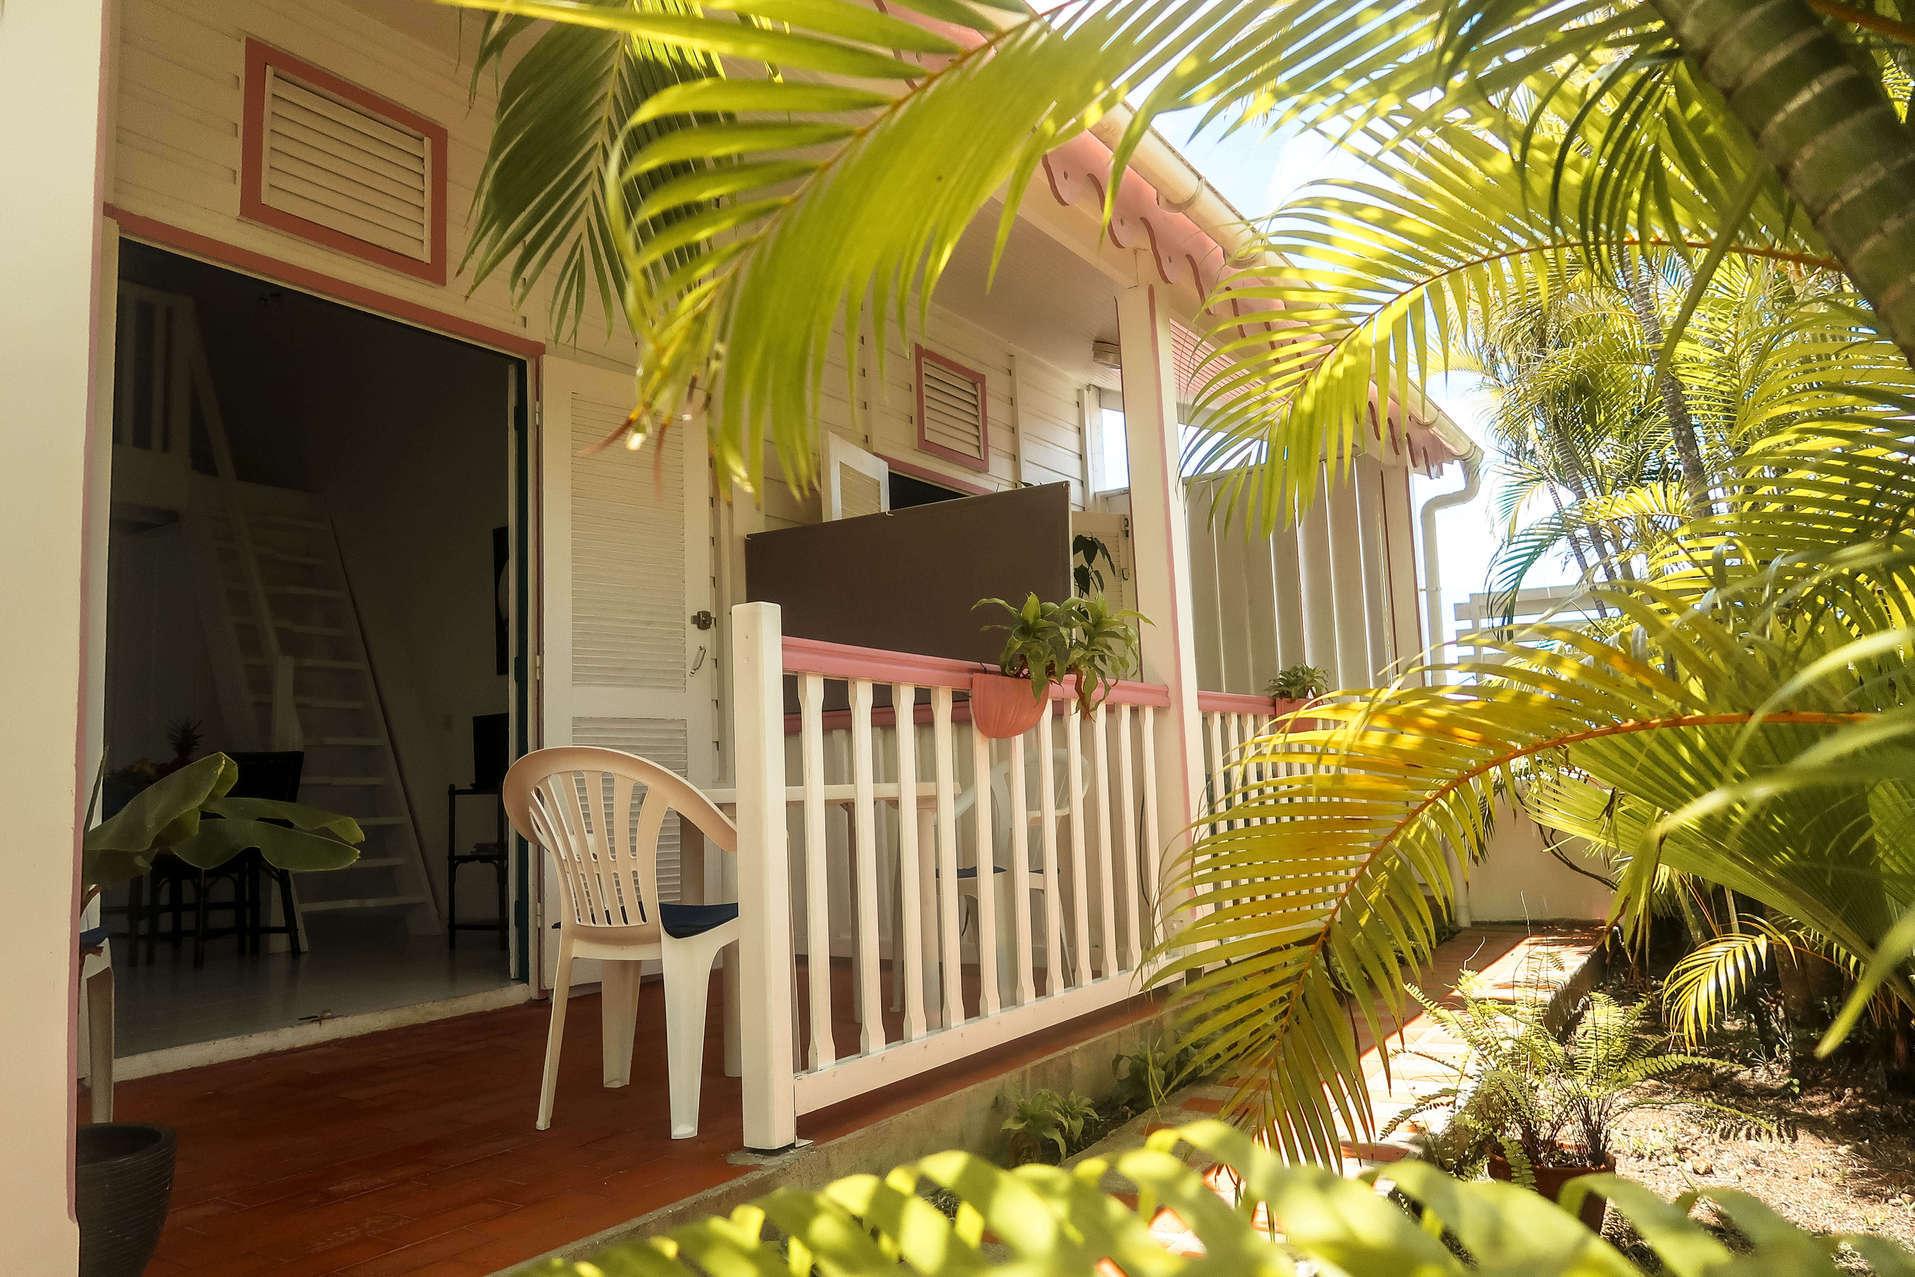 habitation-abricot-location-saisonniere-studio-terrasse-jardin-vegetation